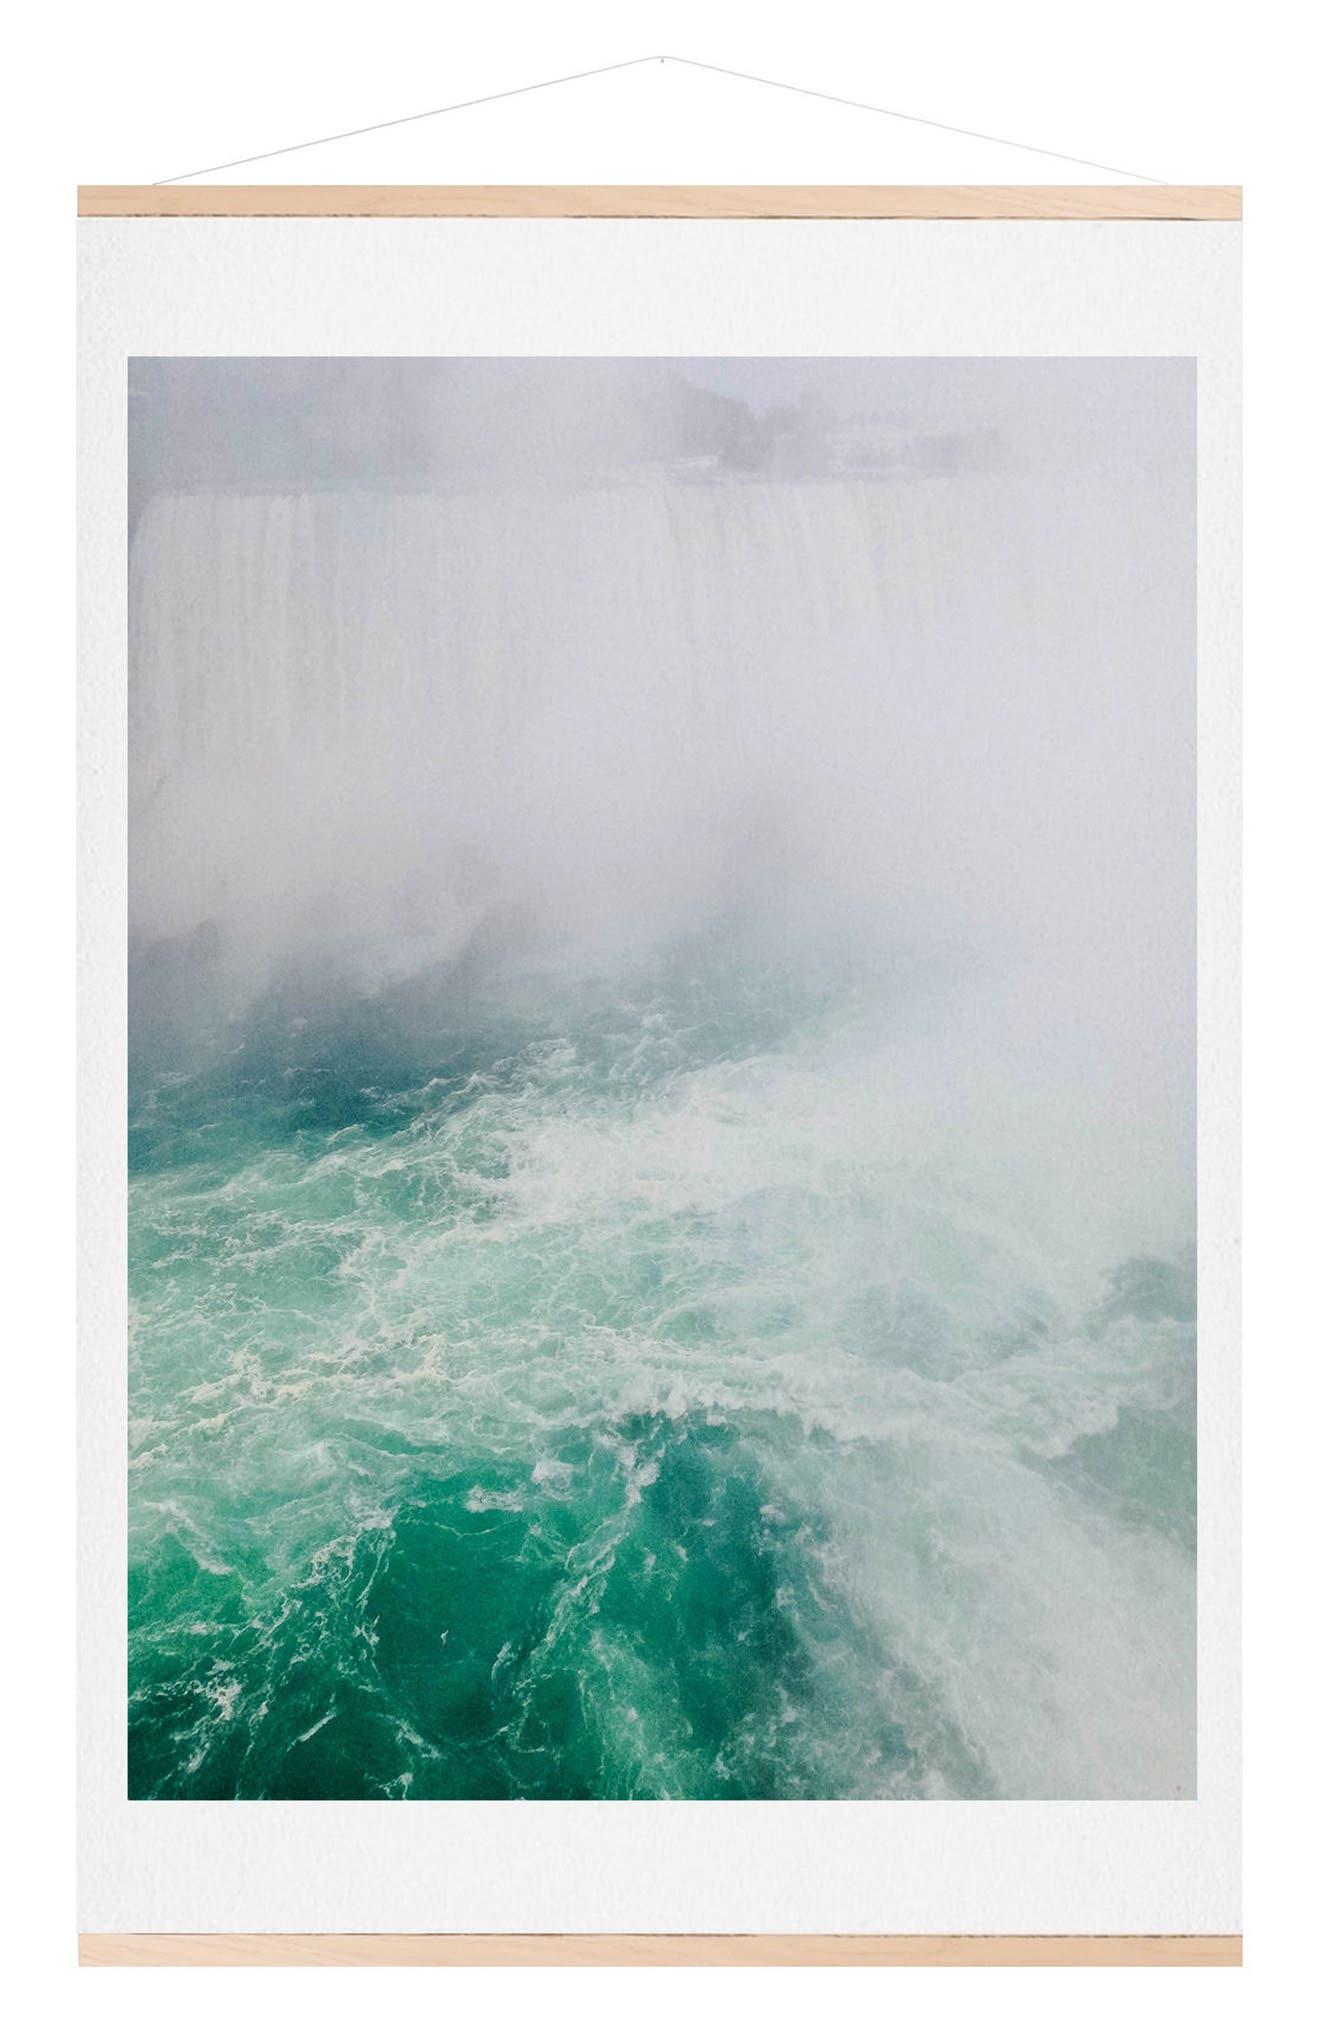 Alternate Image 1 Selected - Deny Designs The Falls Print & Oak Hanger